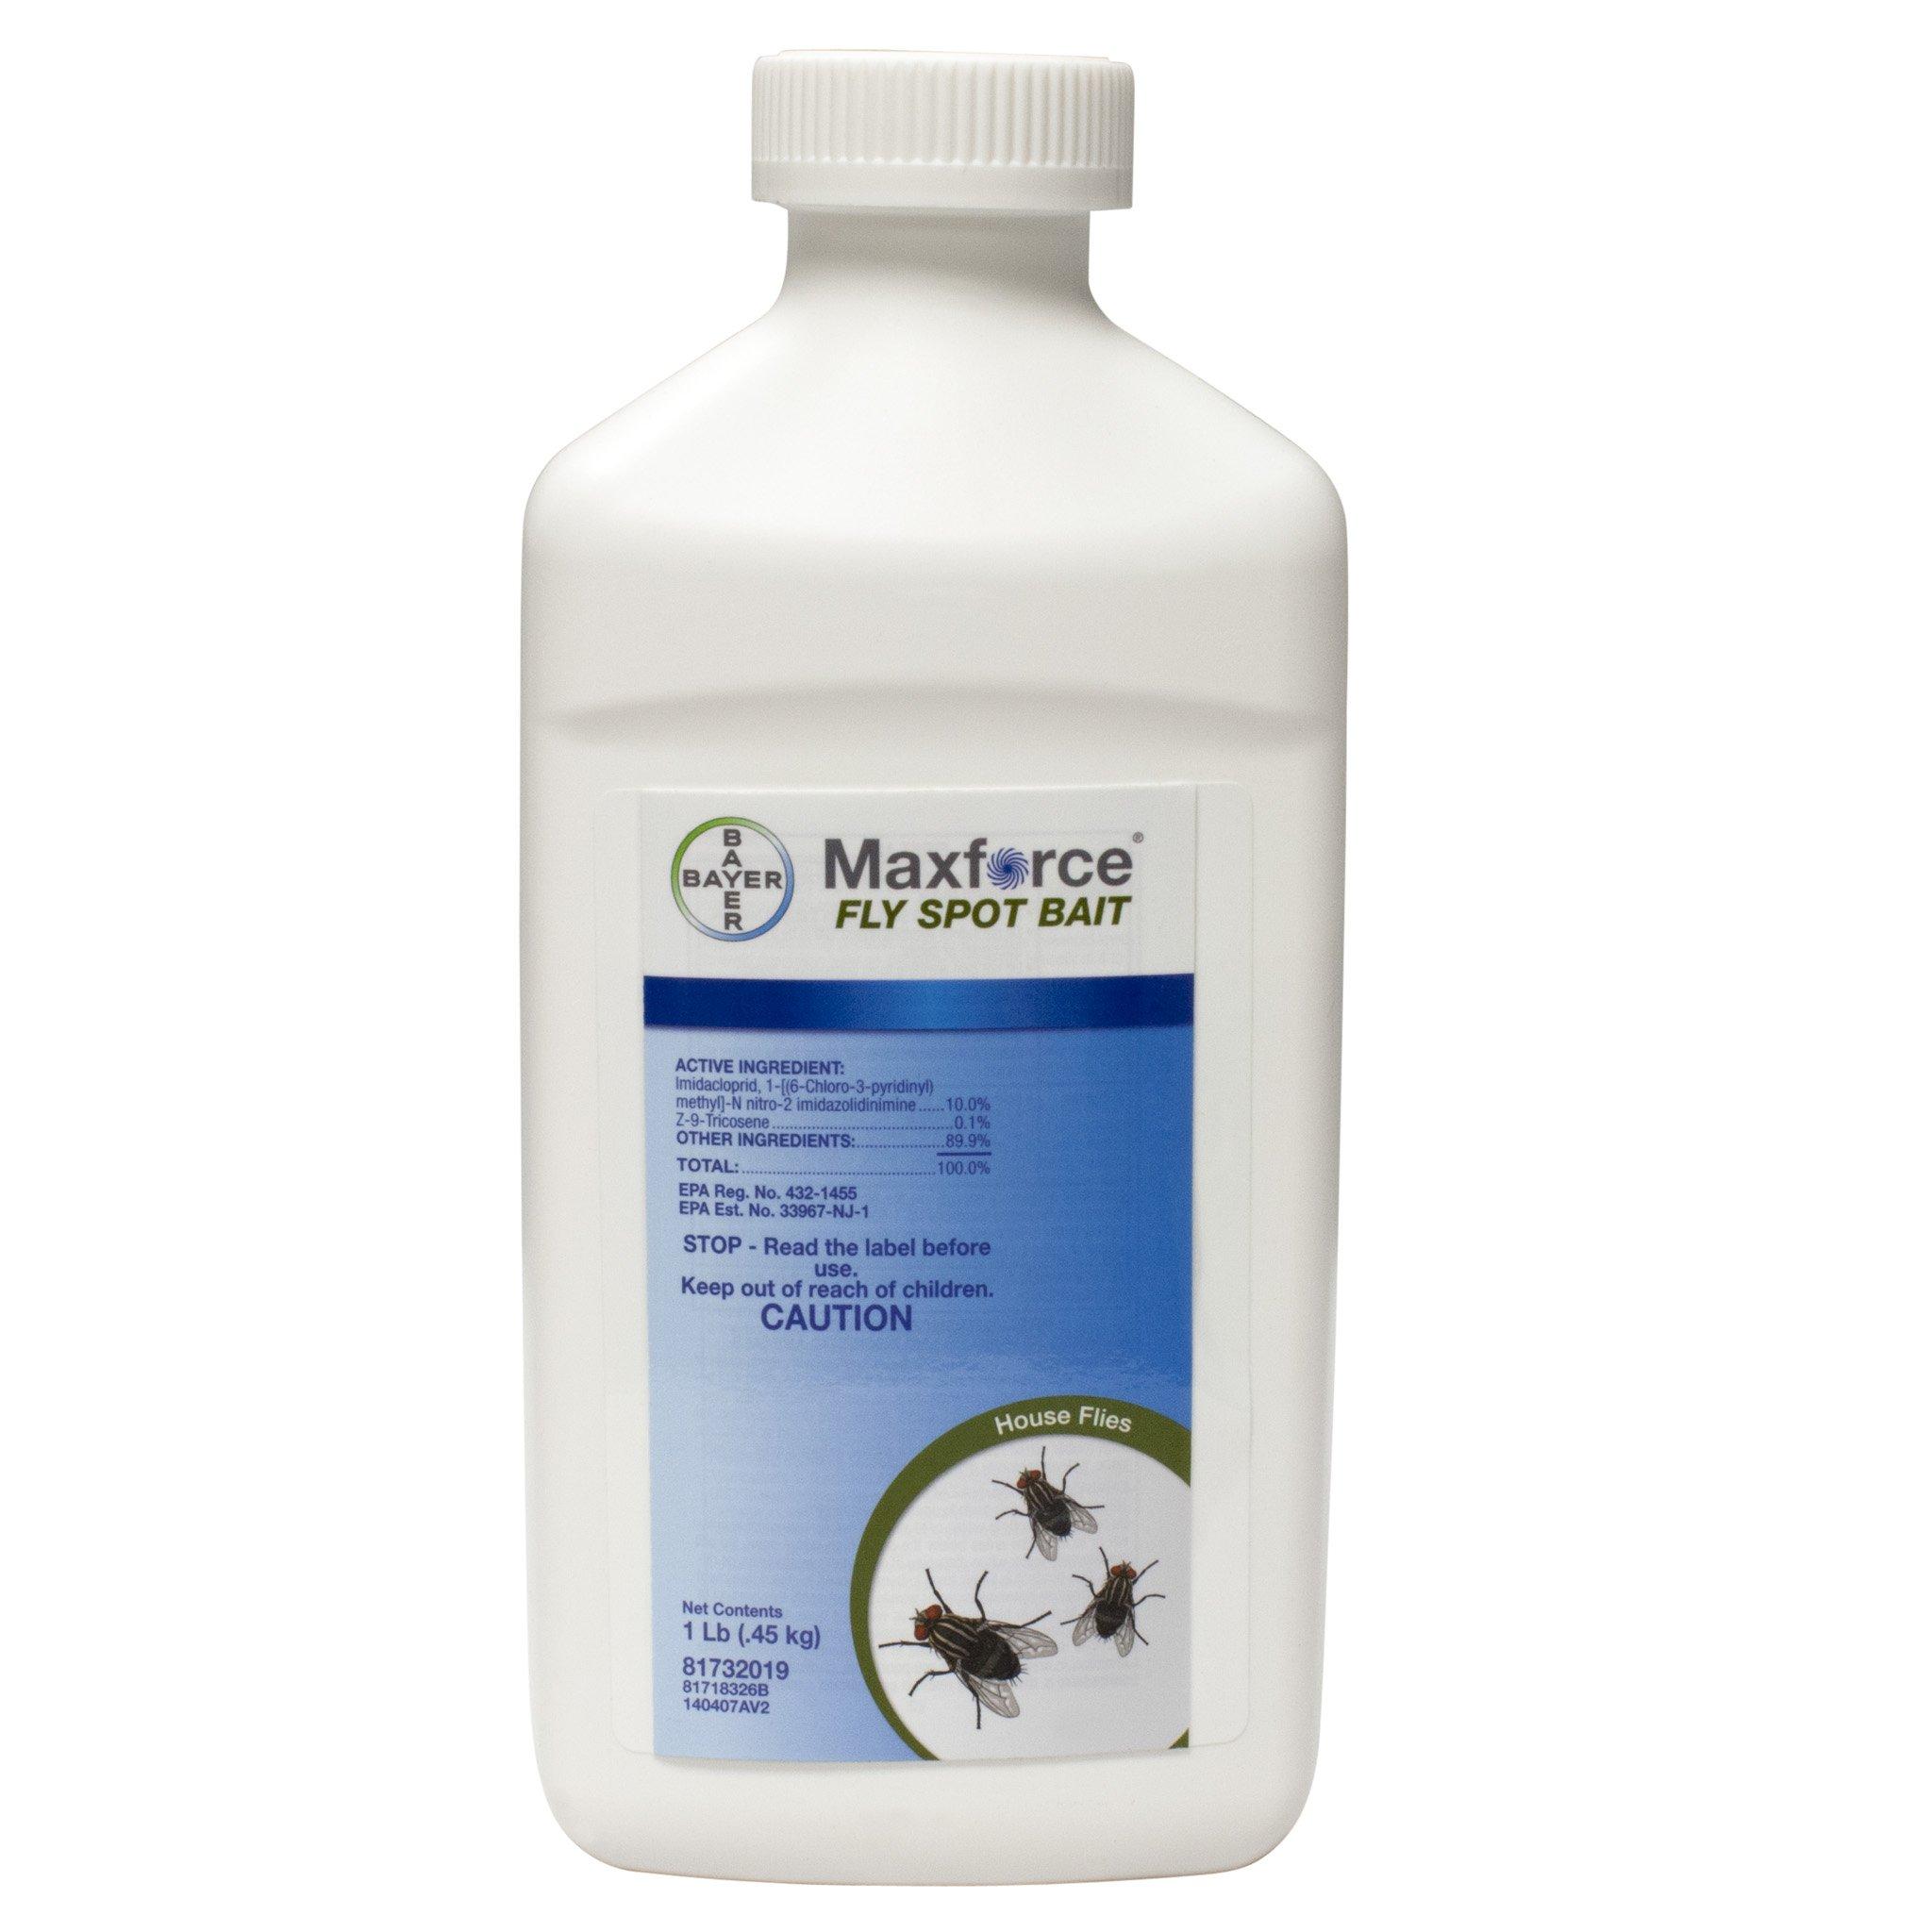 Maxforce Fly Spot Bait - bottle (16 oz.) BA1040 by Max Force